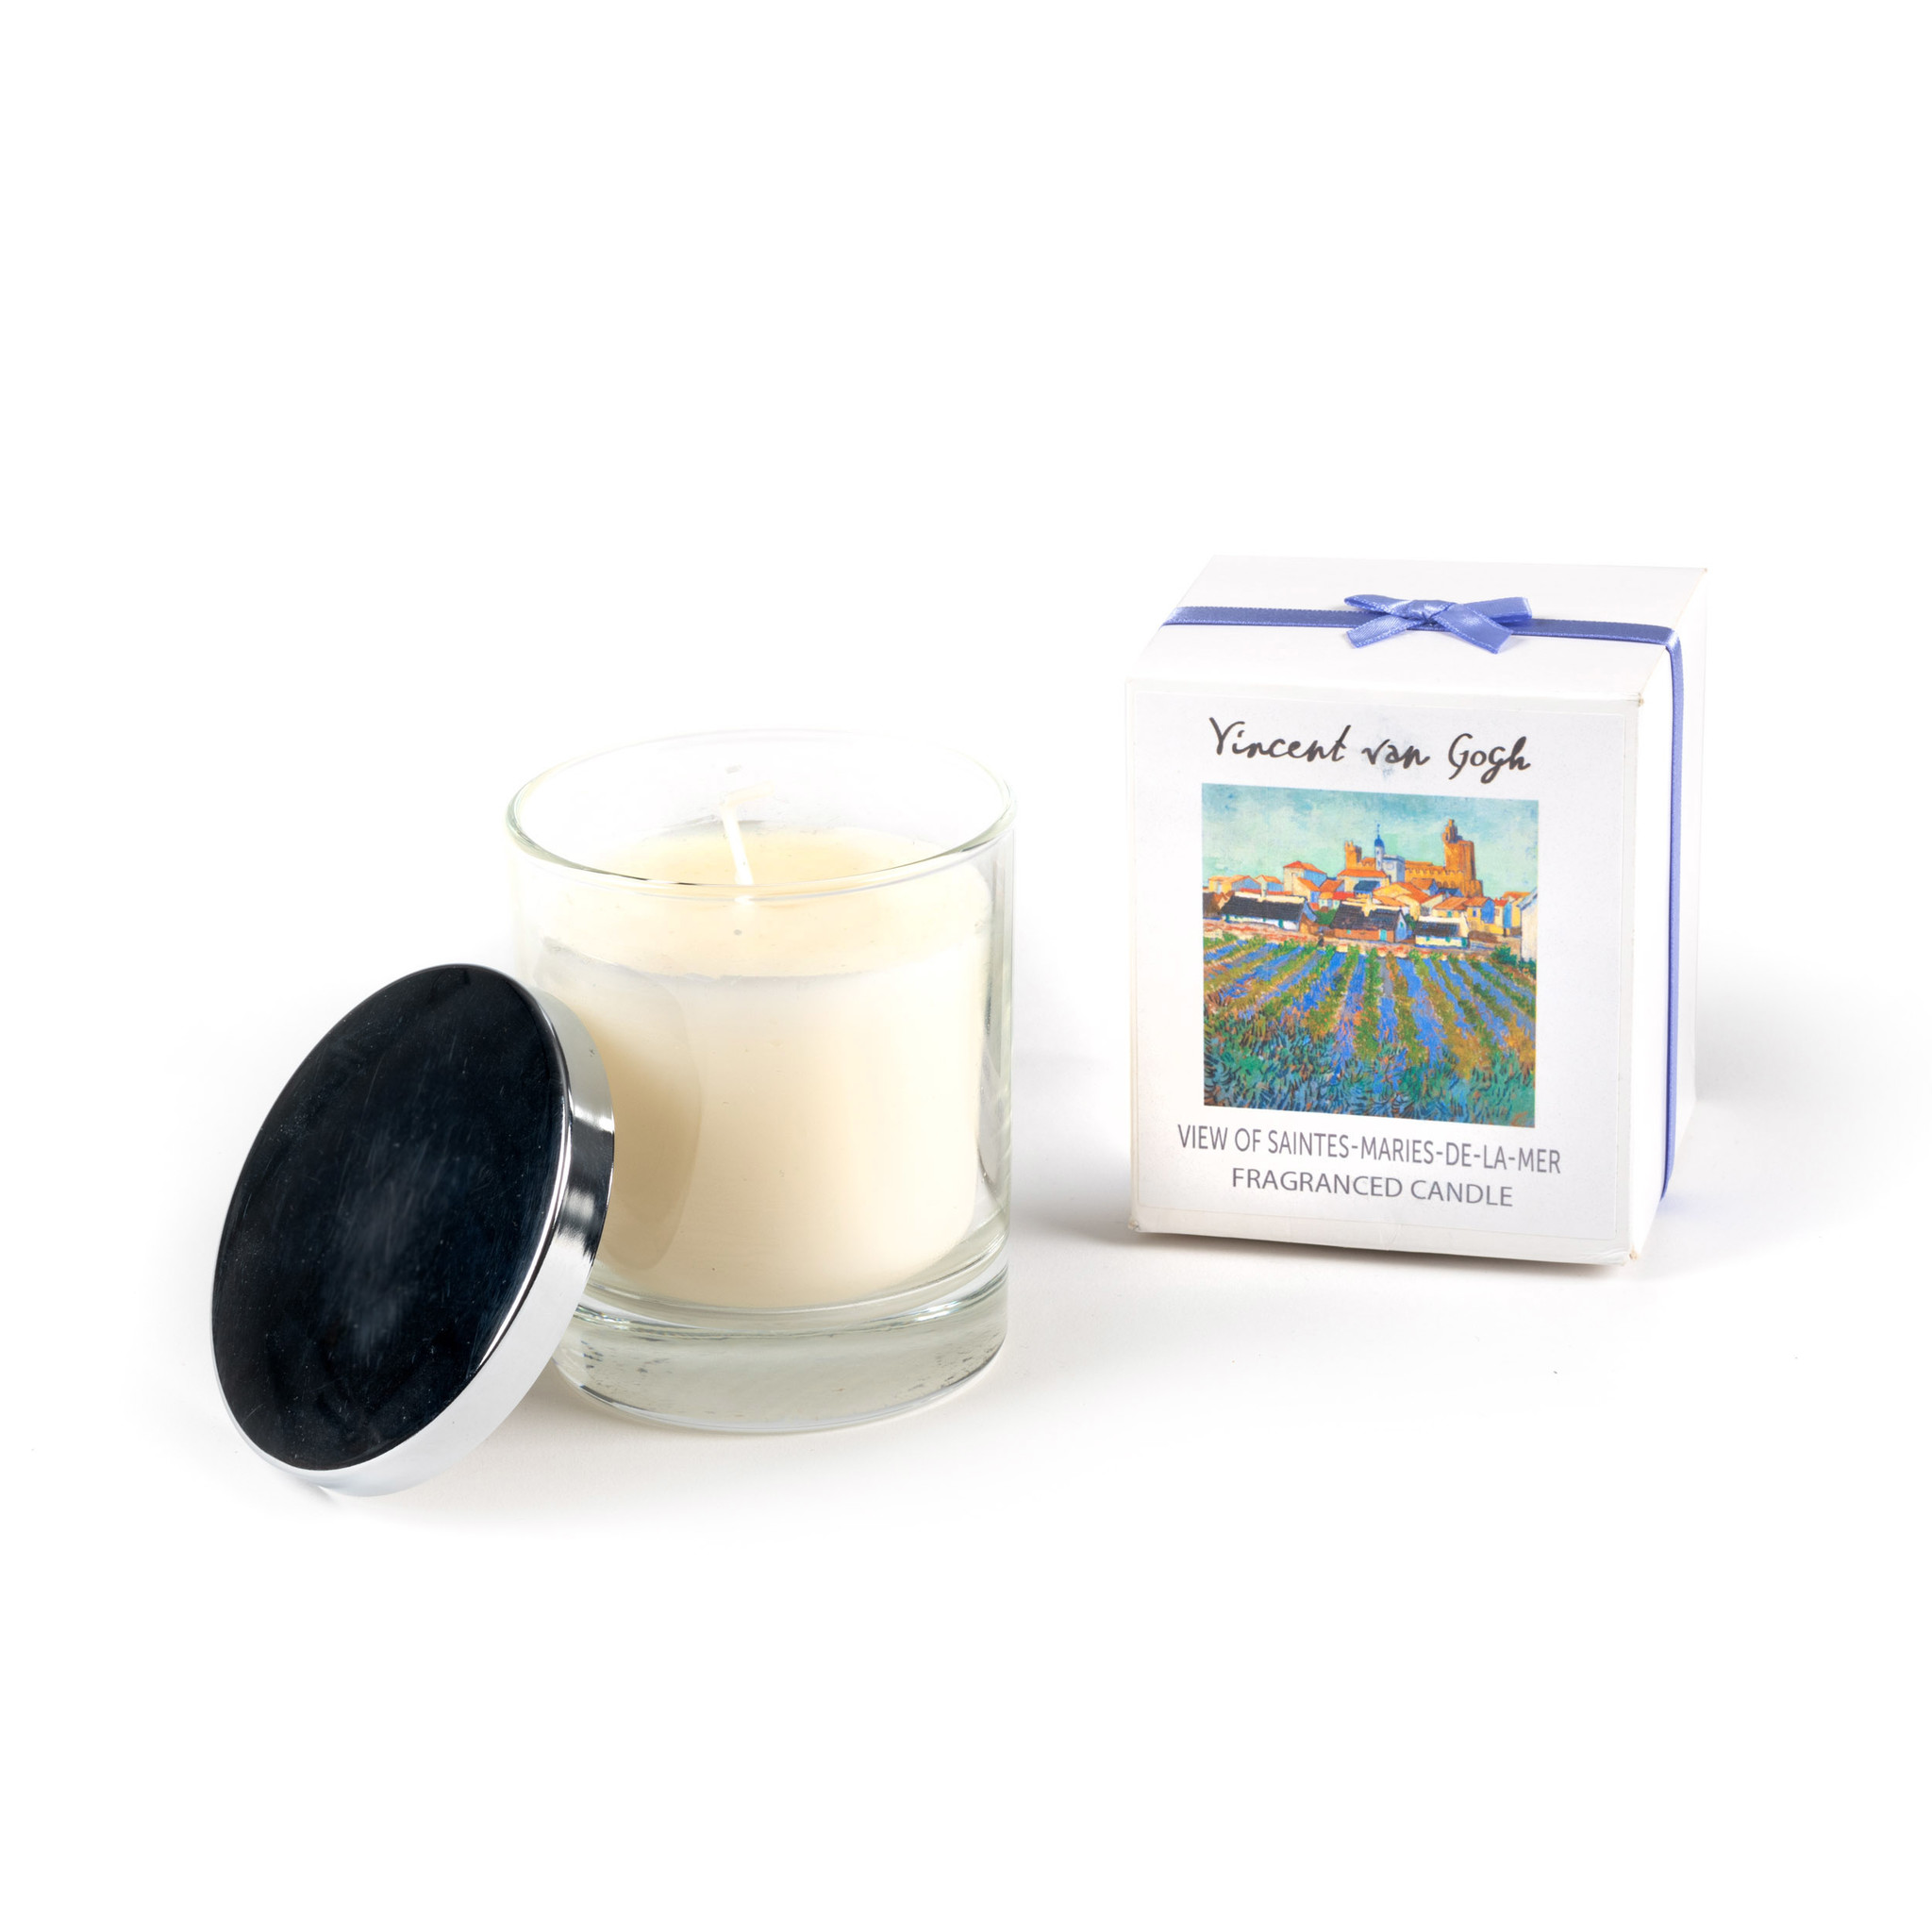 Scented candle Van Gogh View of Saintes-Maries-de-la-Mer